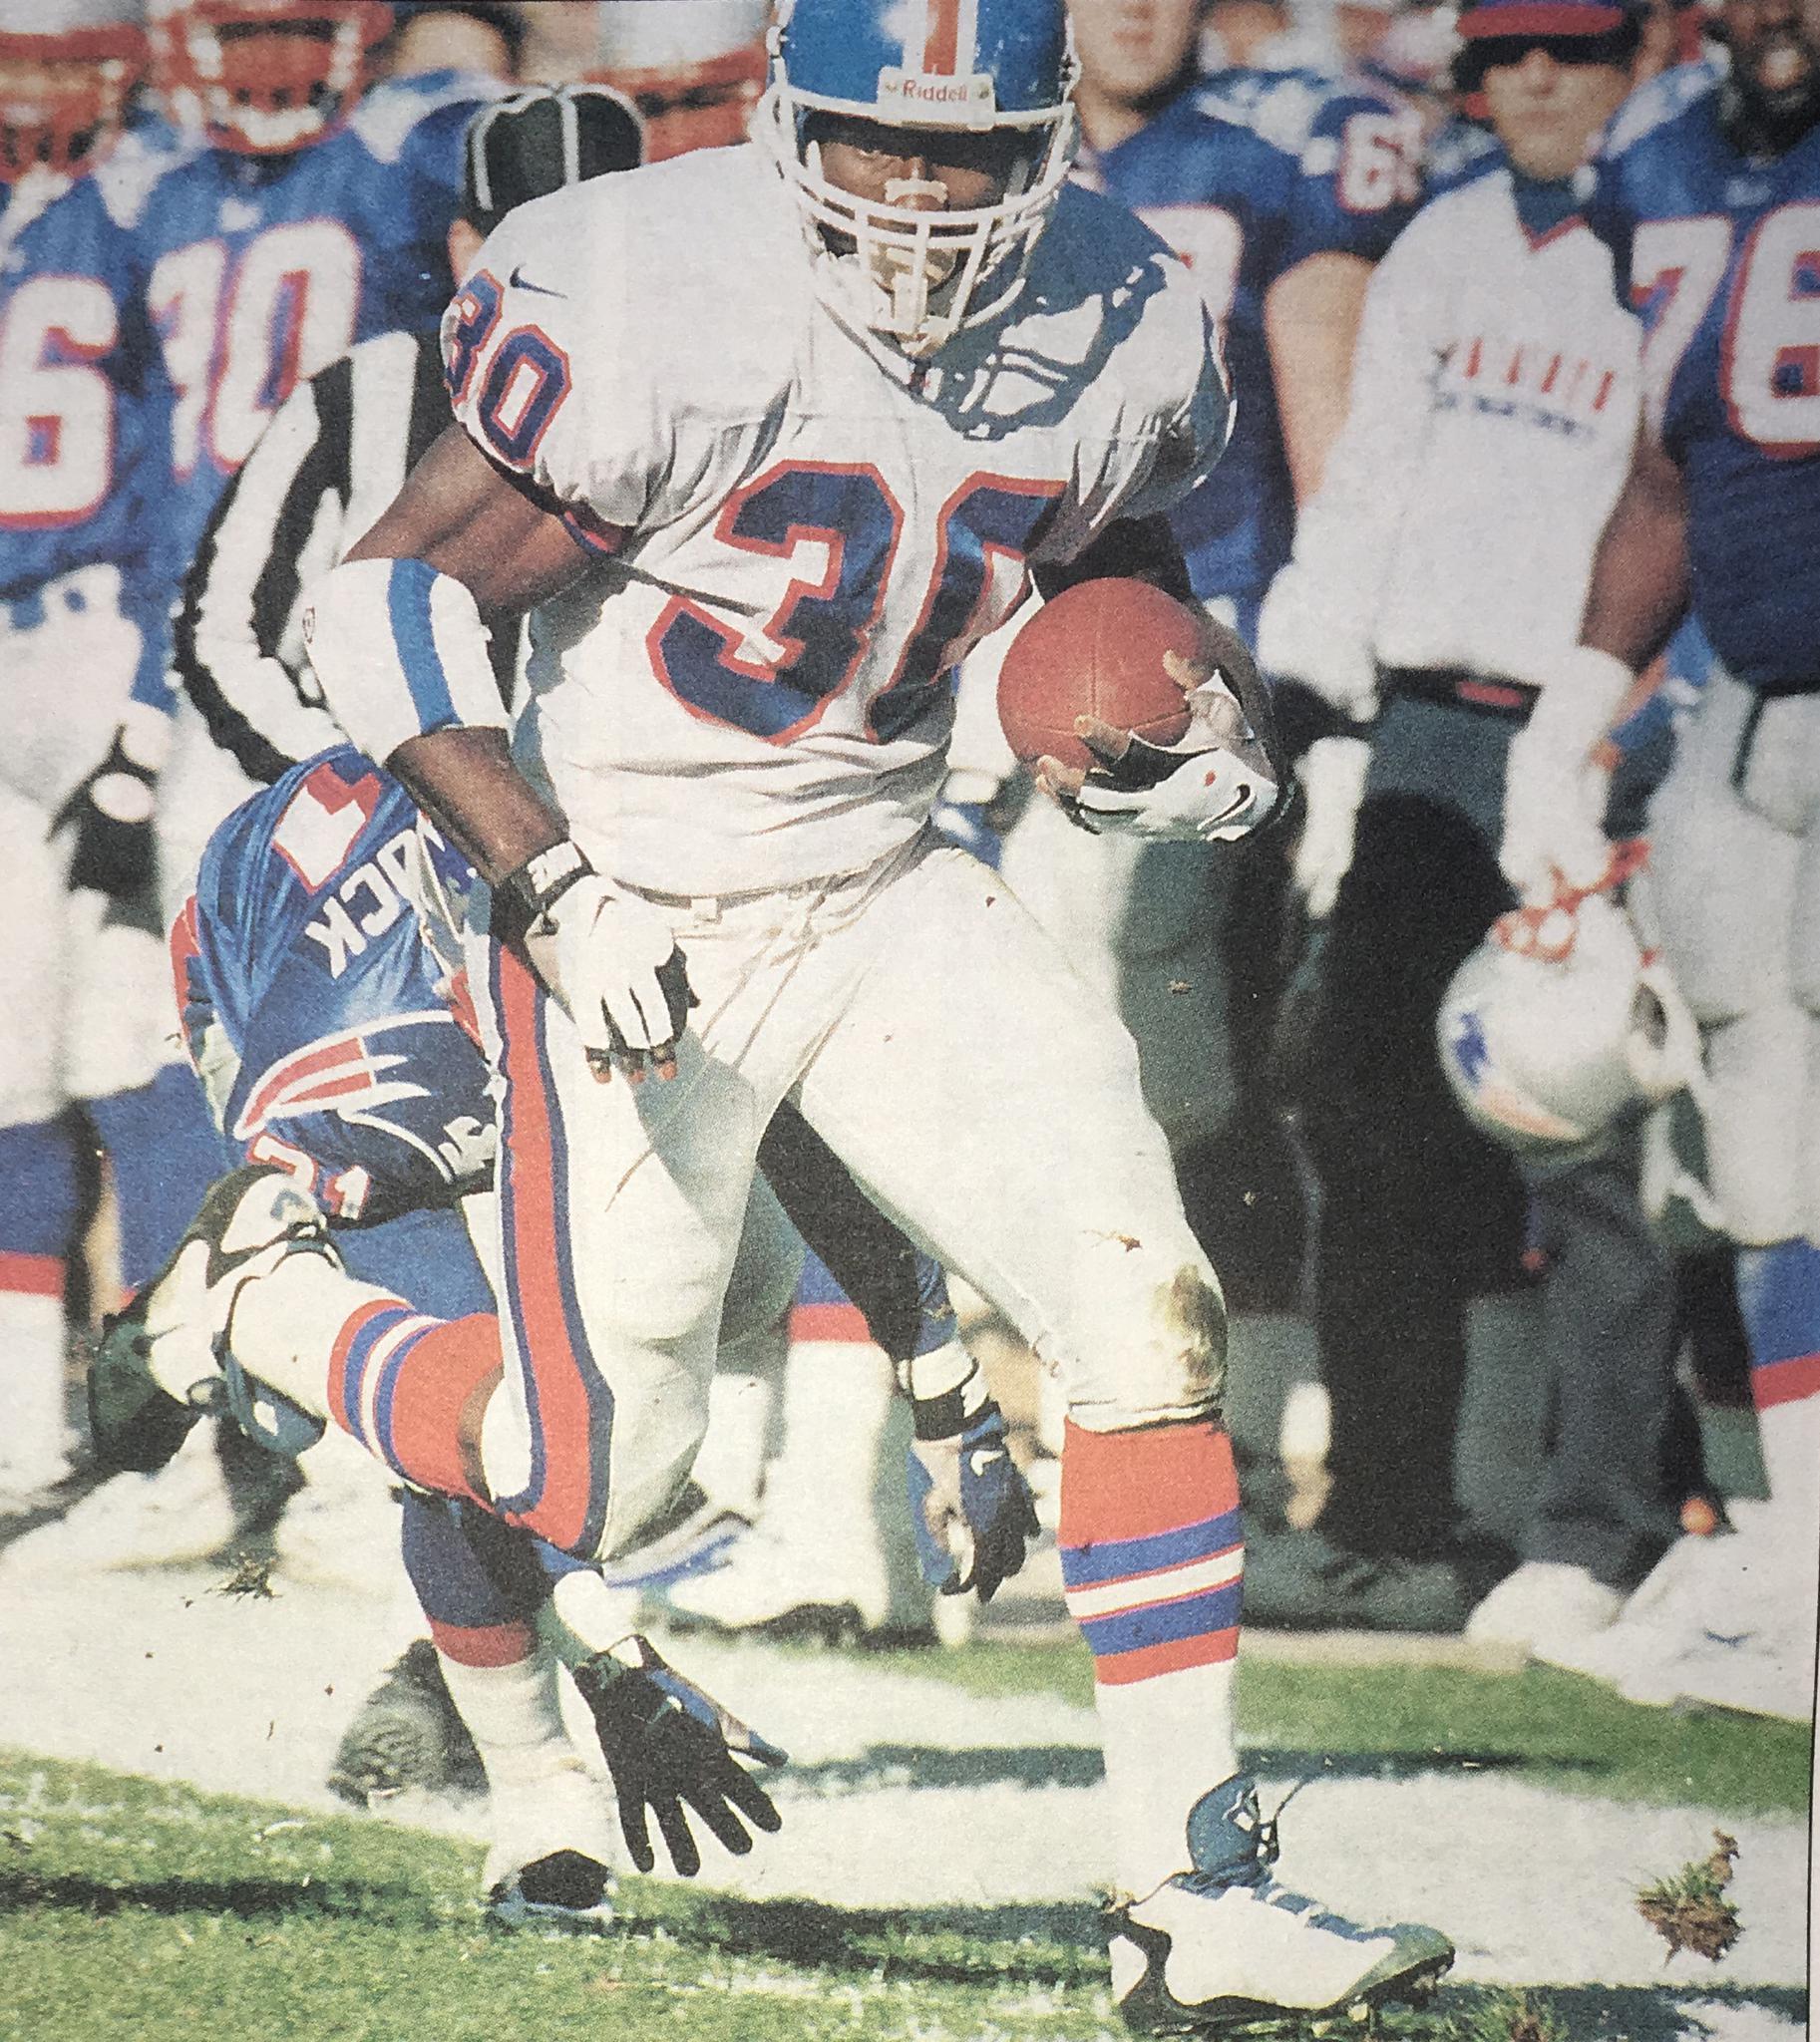 Terrell Davis ran all over the Patriots.